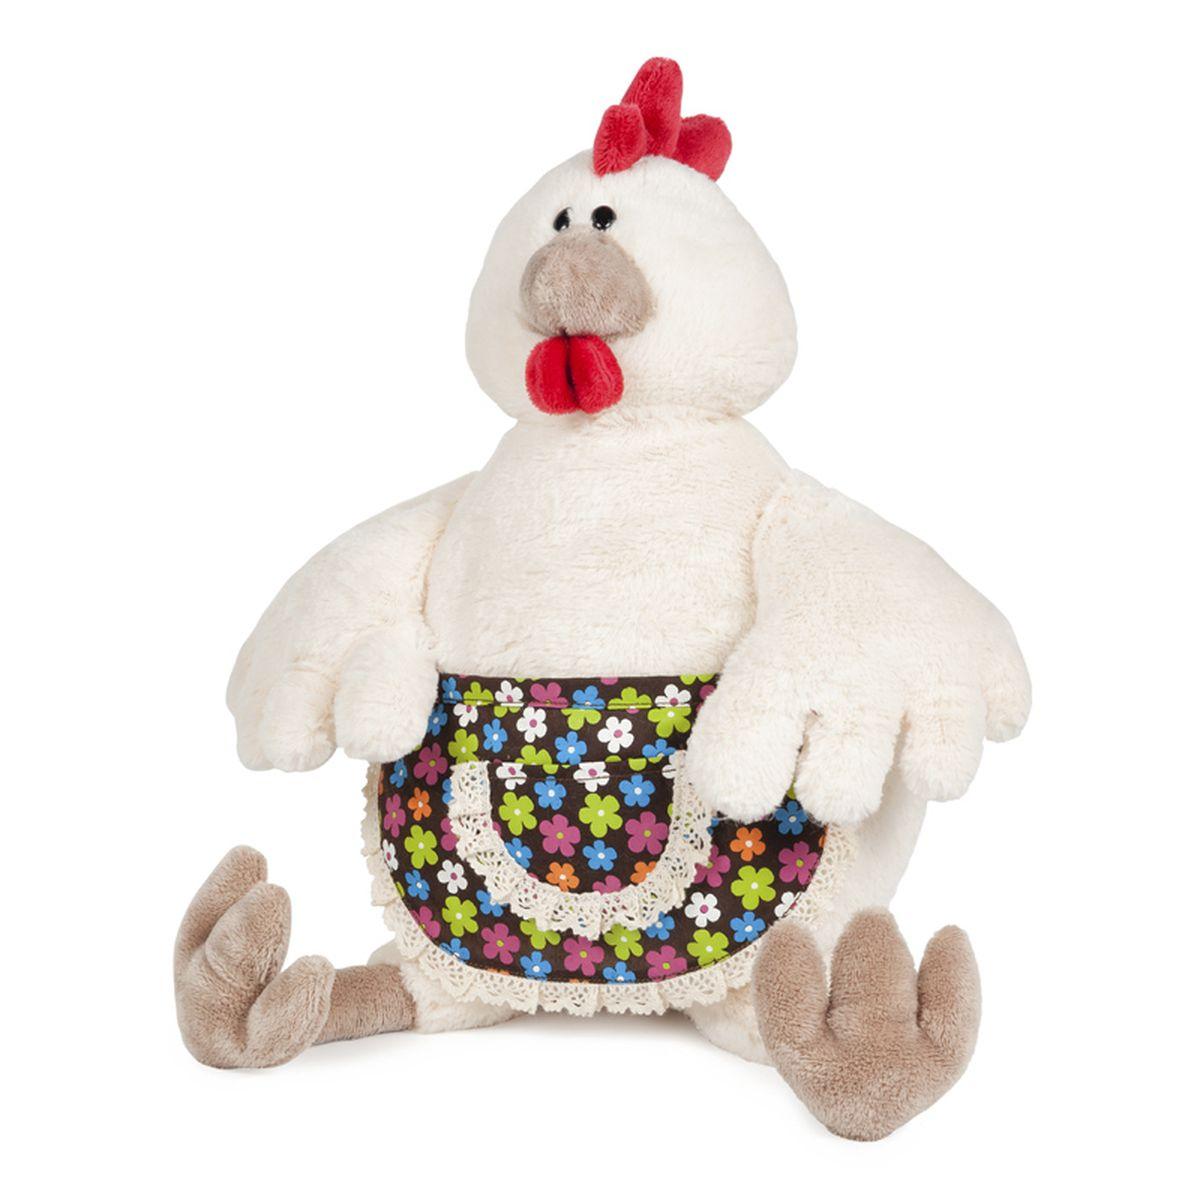 Maxi Toys Мягкая игрушка Курочка Ряба 28 смMT-TSA-8326-28